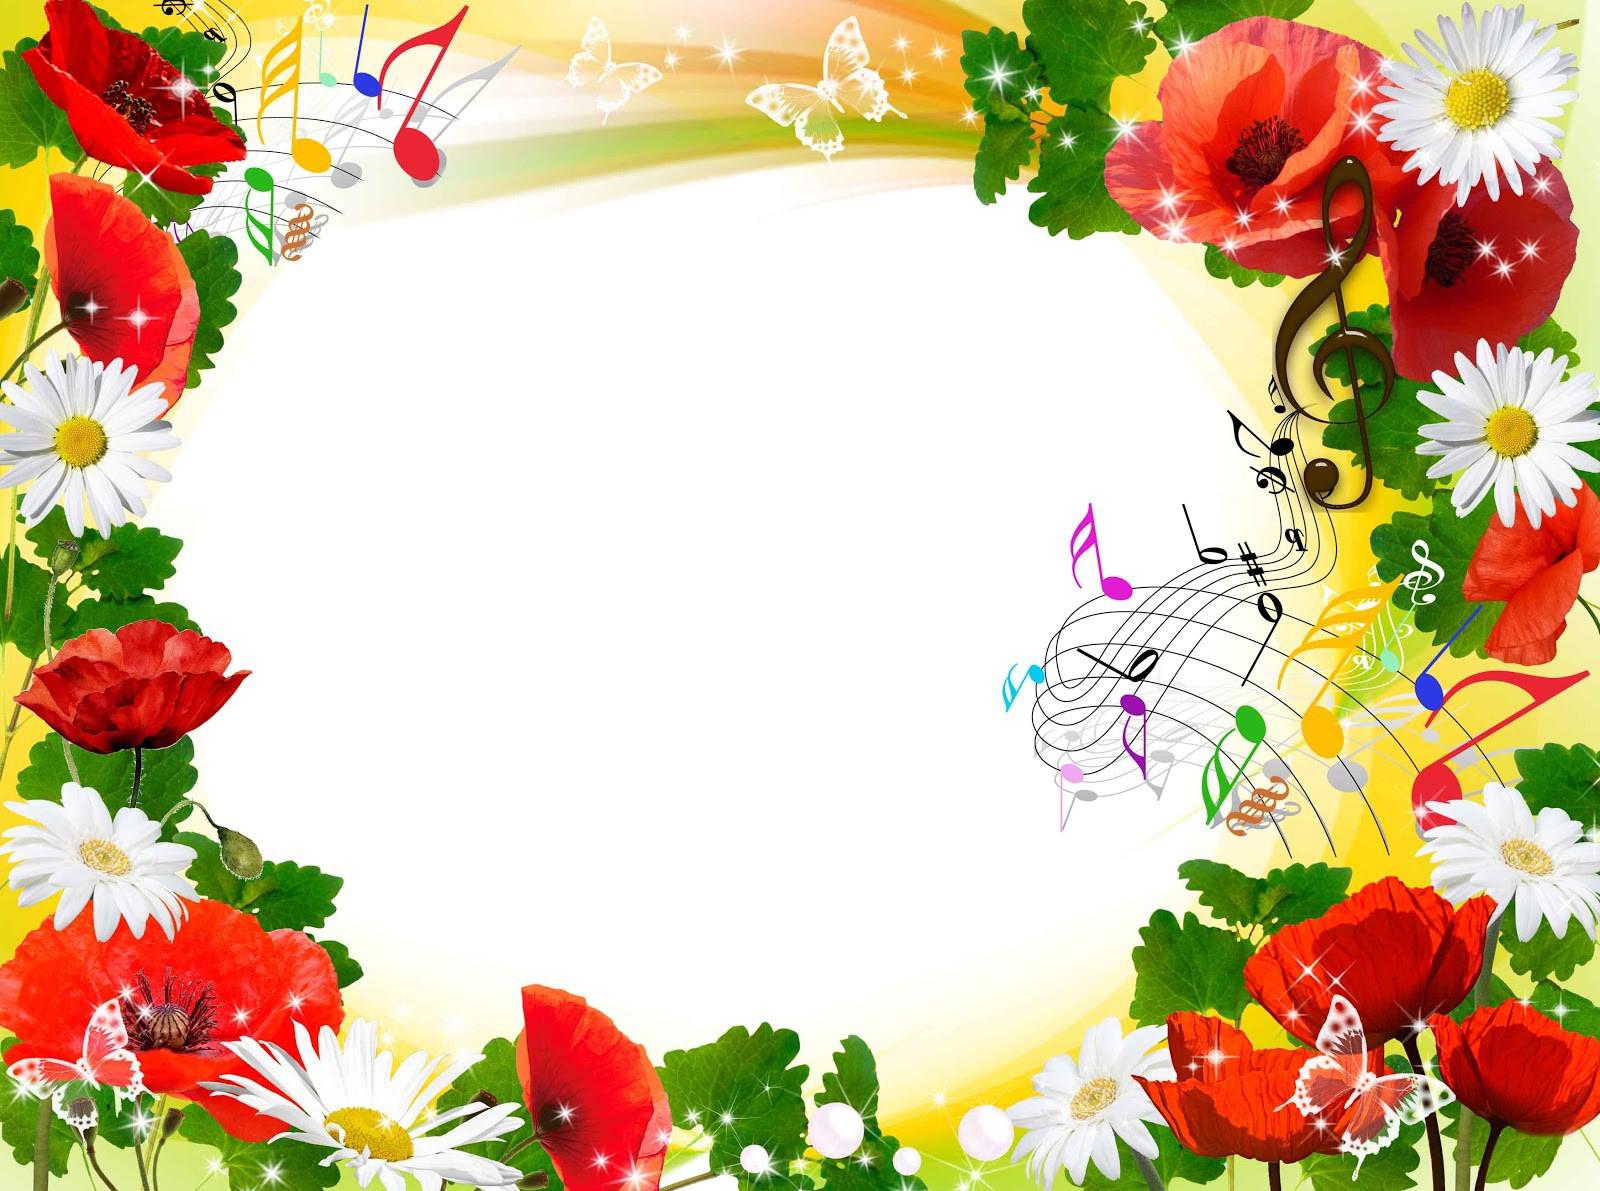 Flower Frame PNG Transparent Images, Pictures, Photos.